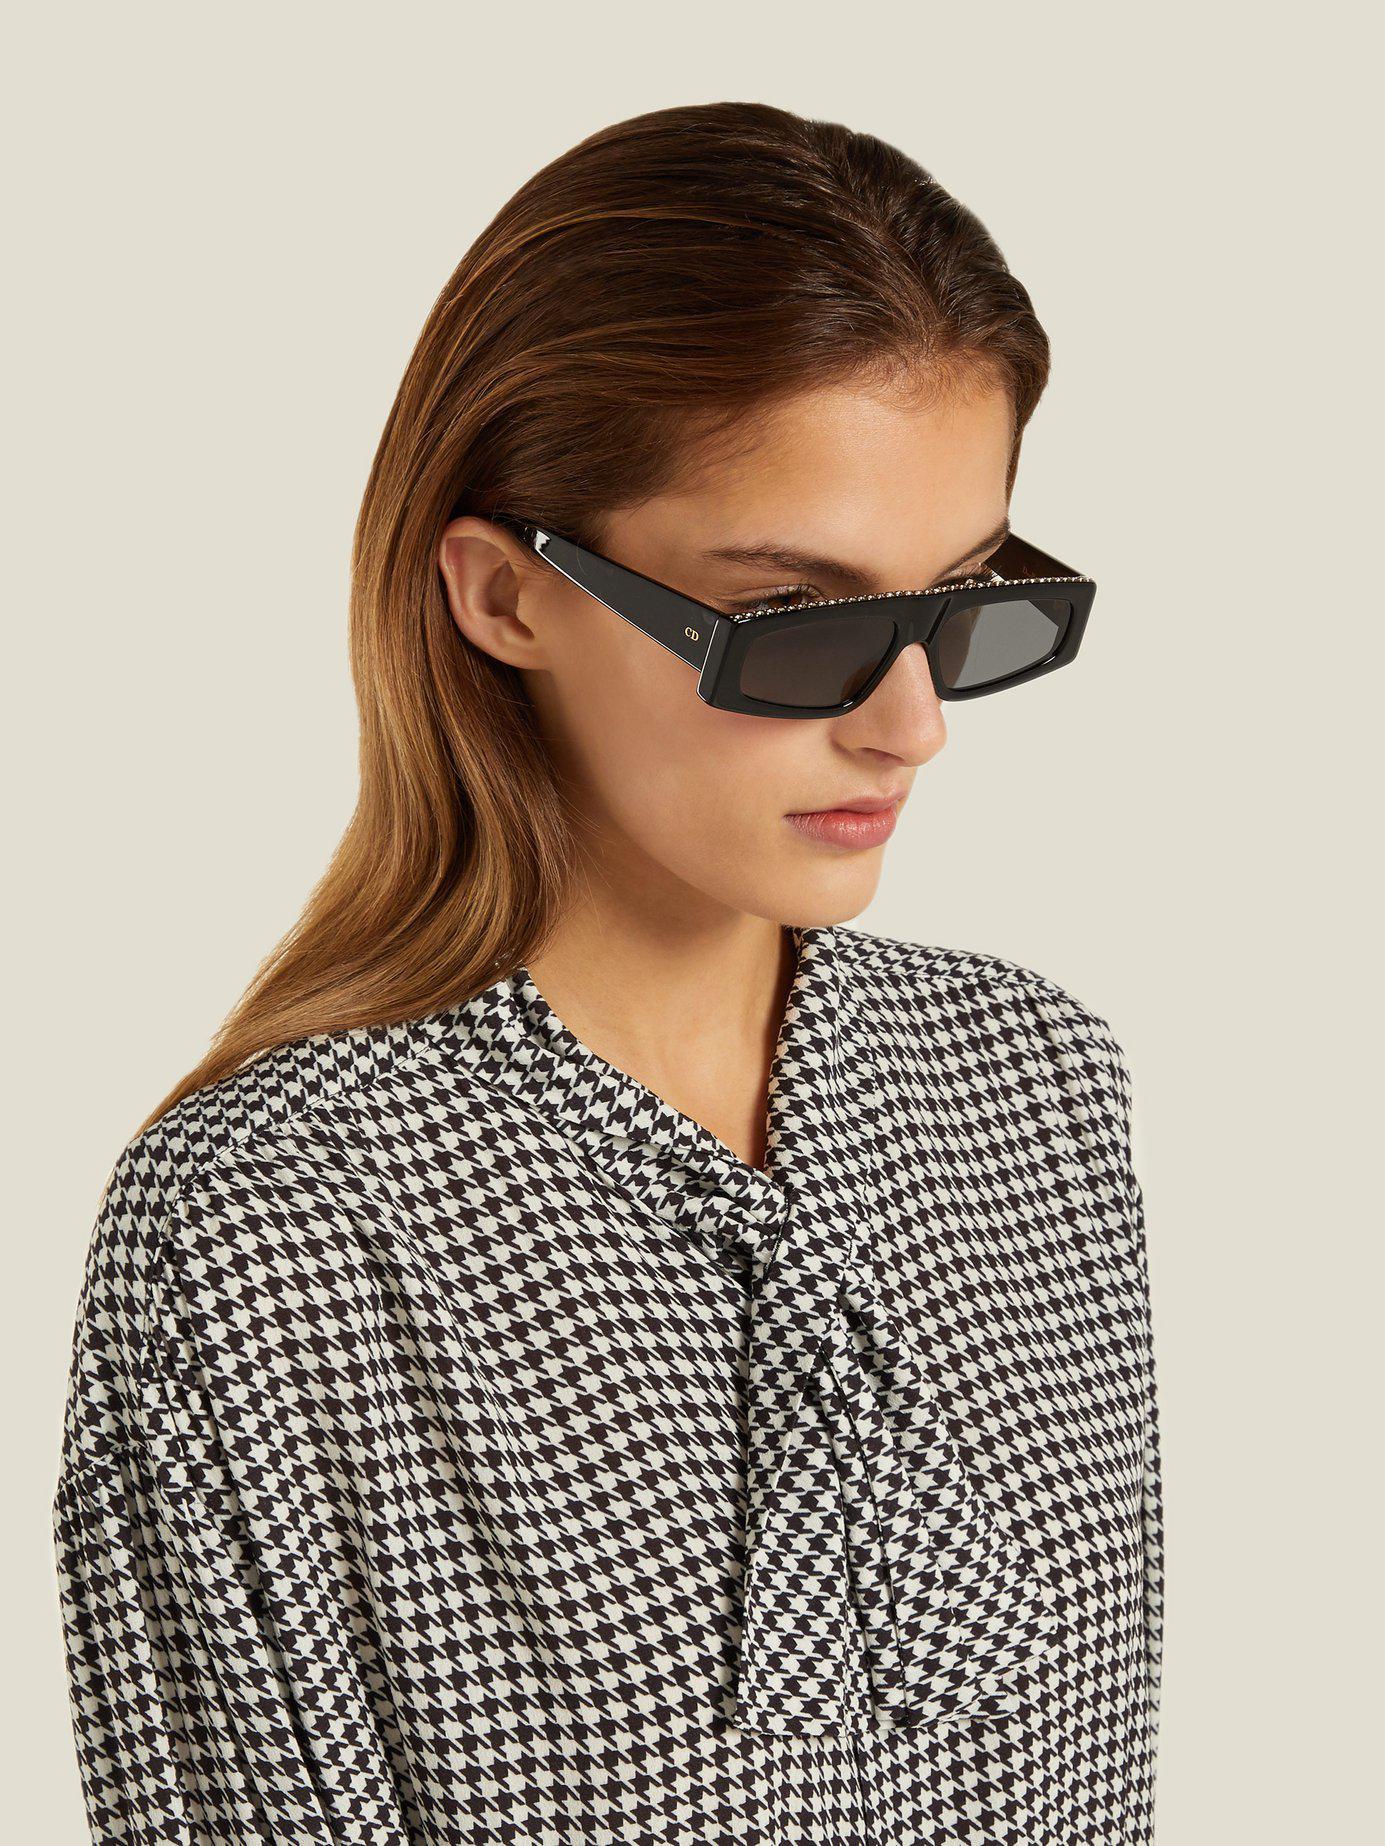 08c3578b3ba0 Dior Power Sunglasses in Black - Lyst